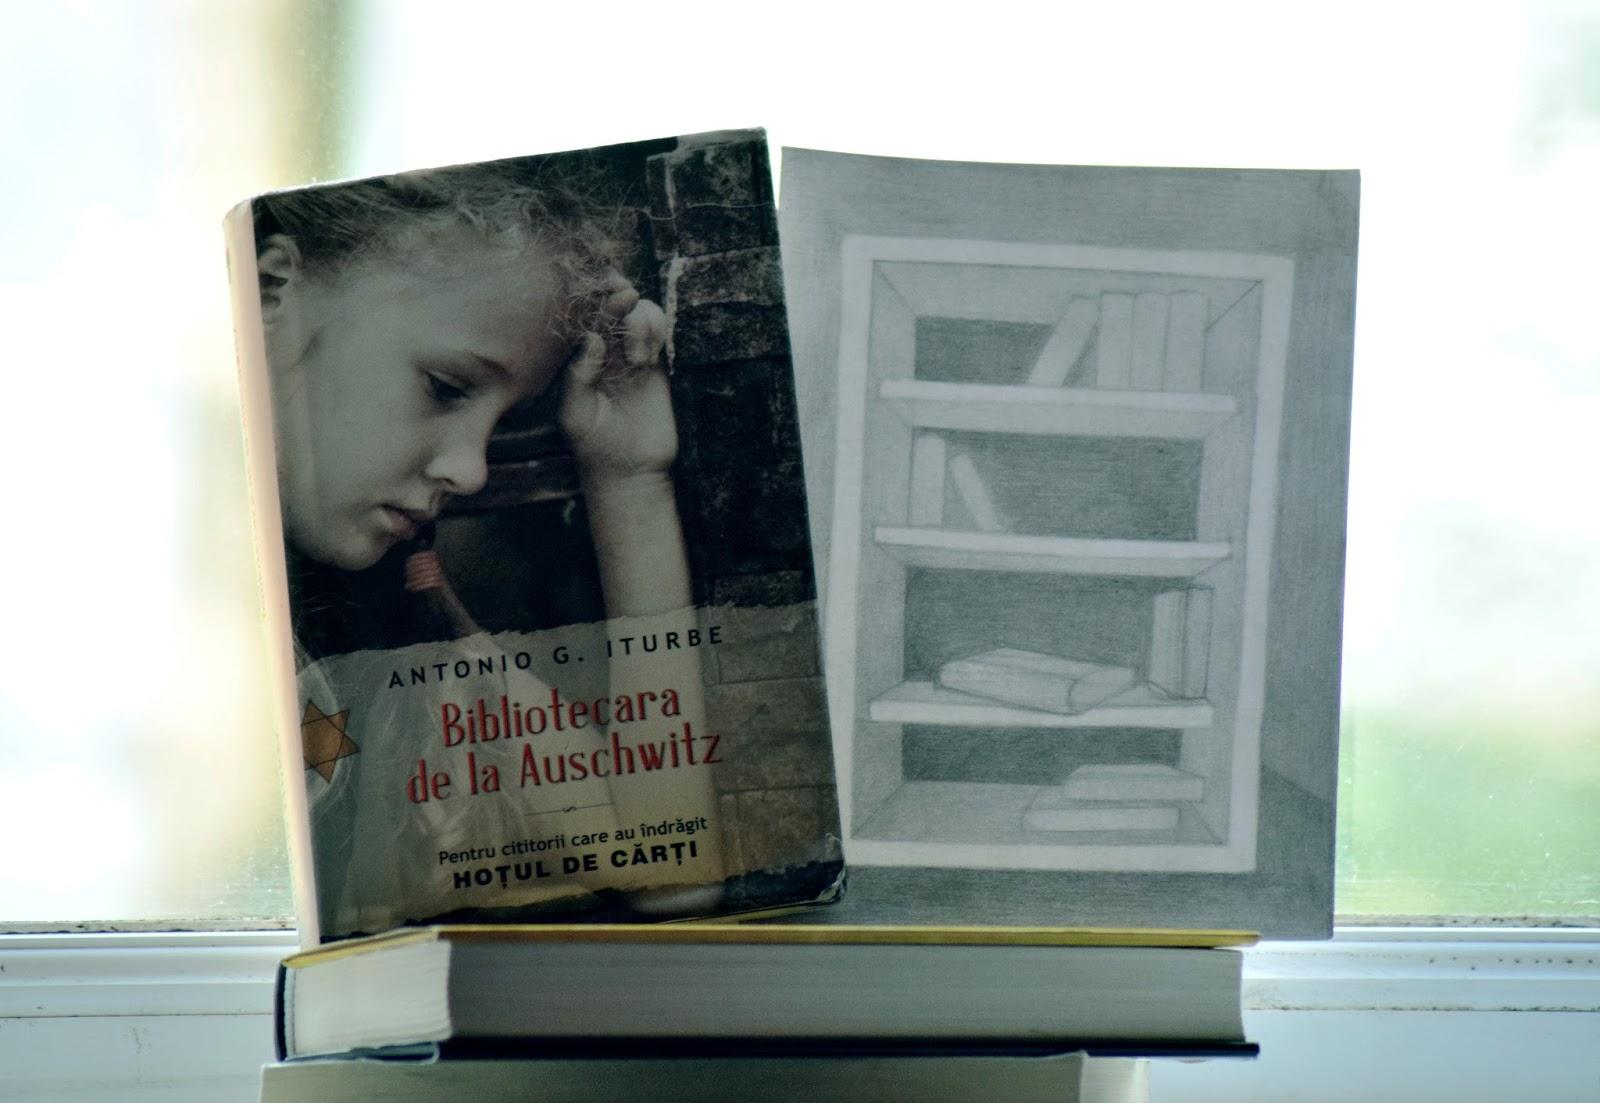 "Bibliotecara de la Auschwitz, Antonio G. Iturbe. """